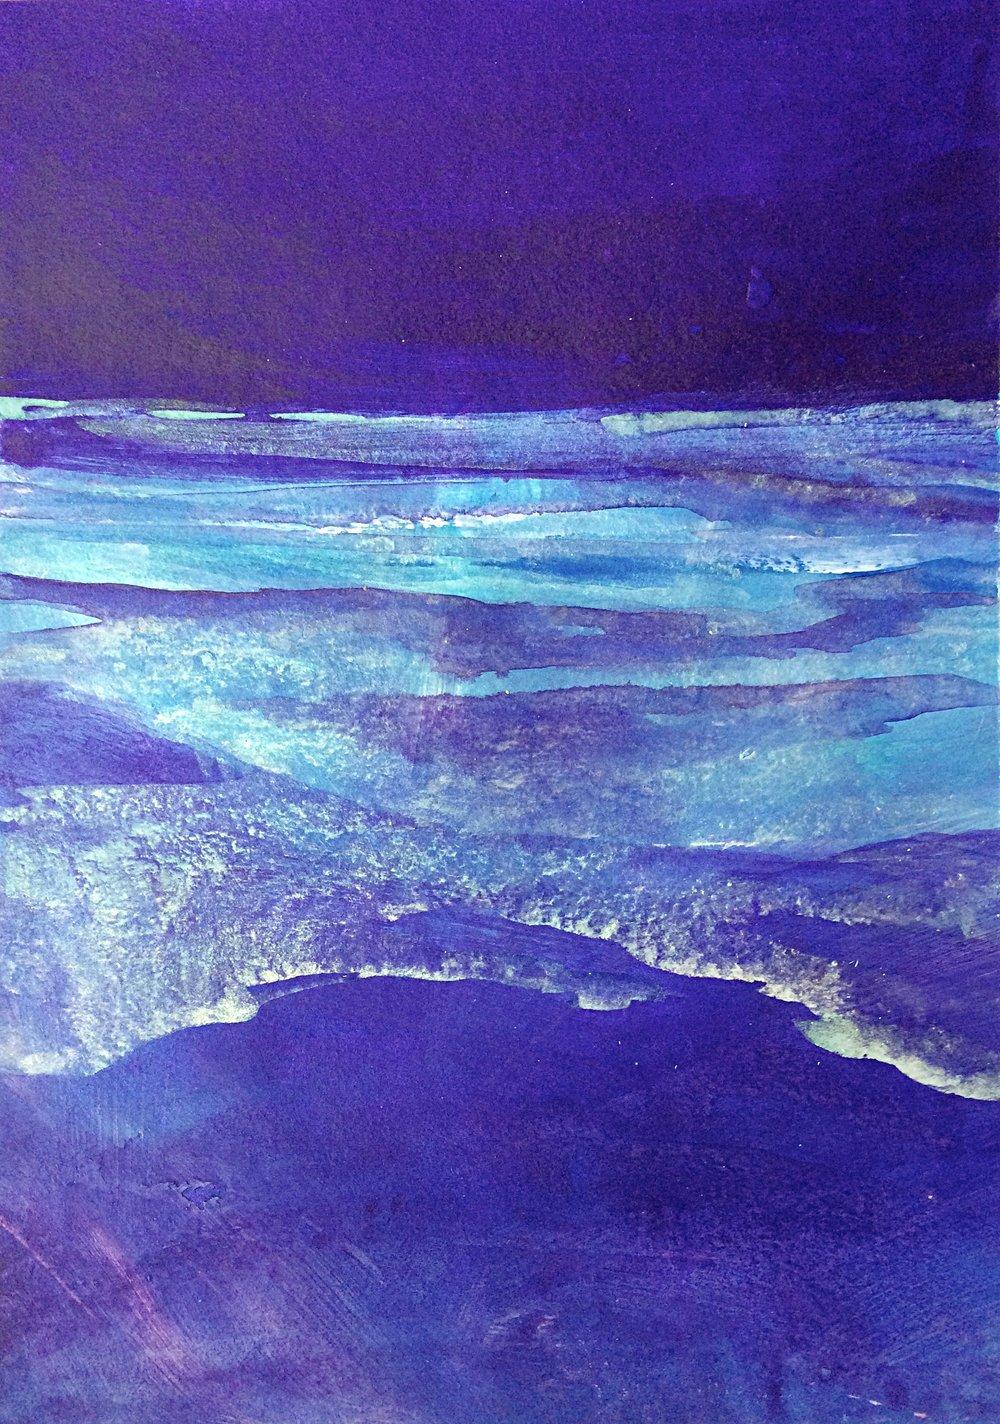 Shimmering Sea II